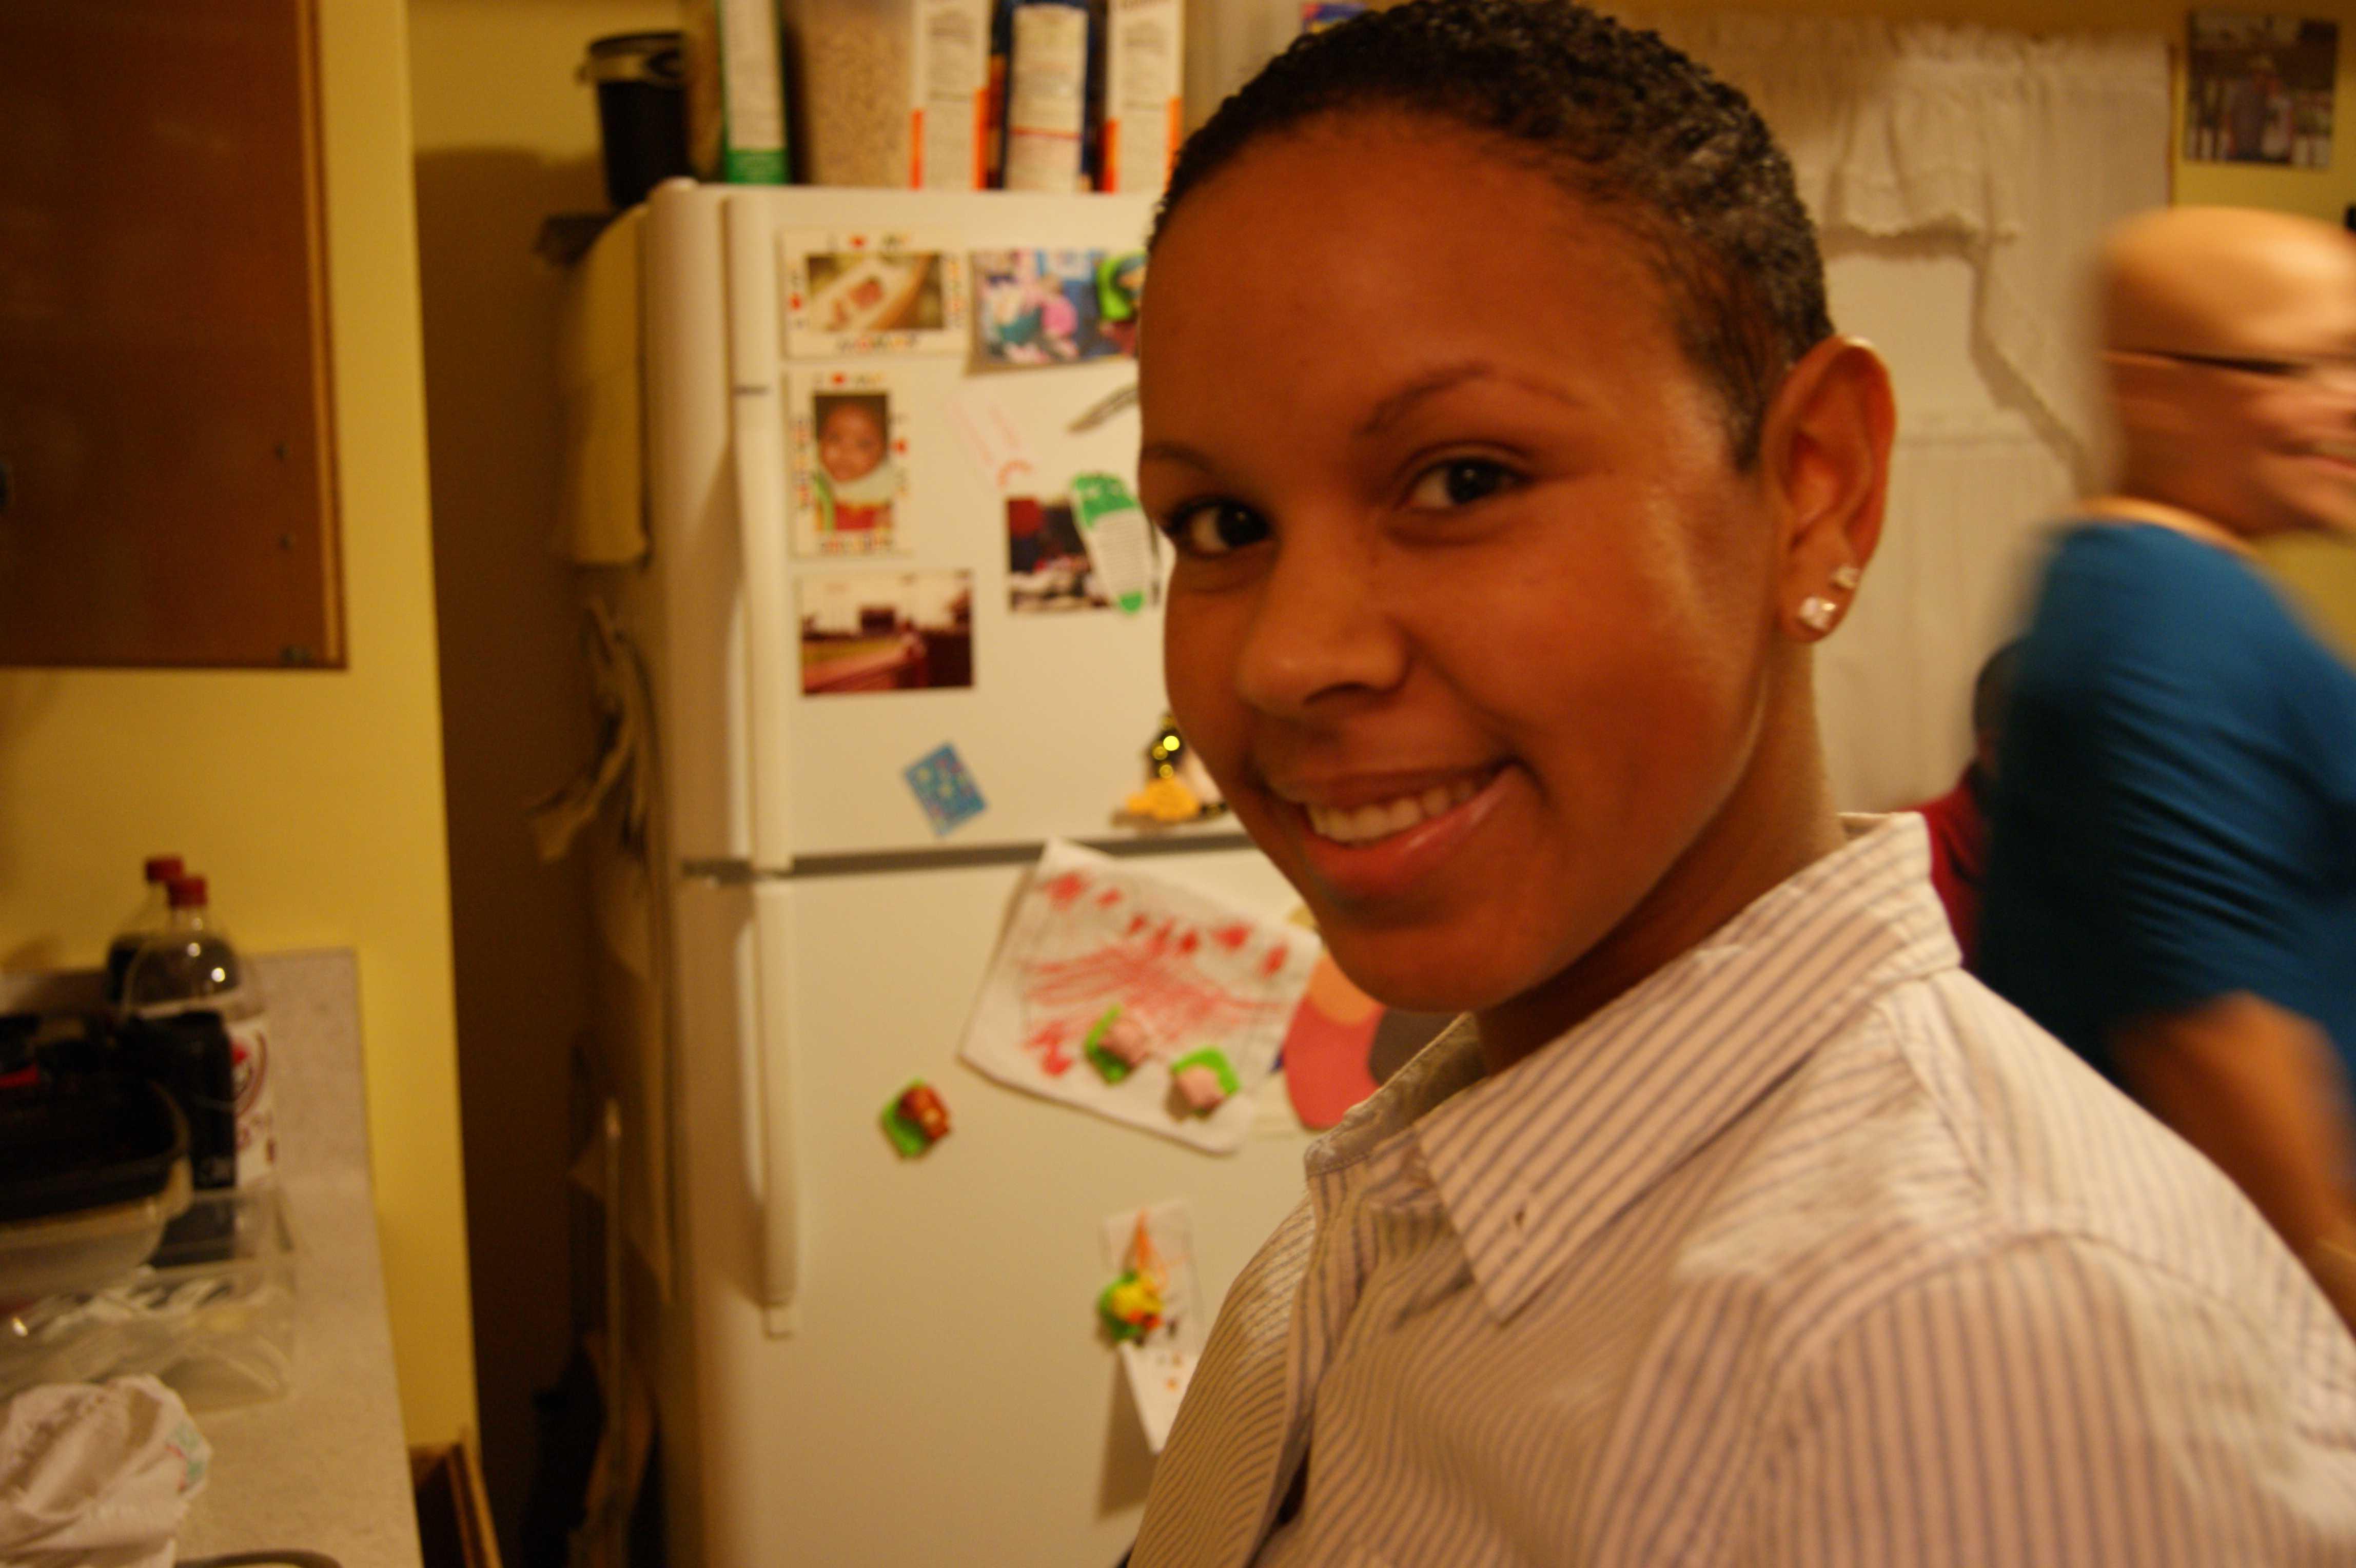 My sister Jessica